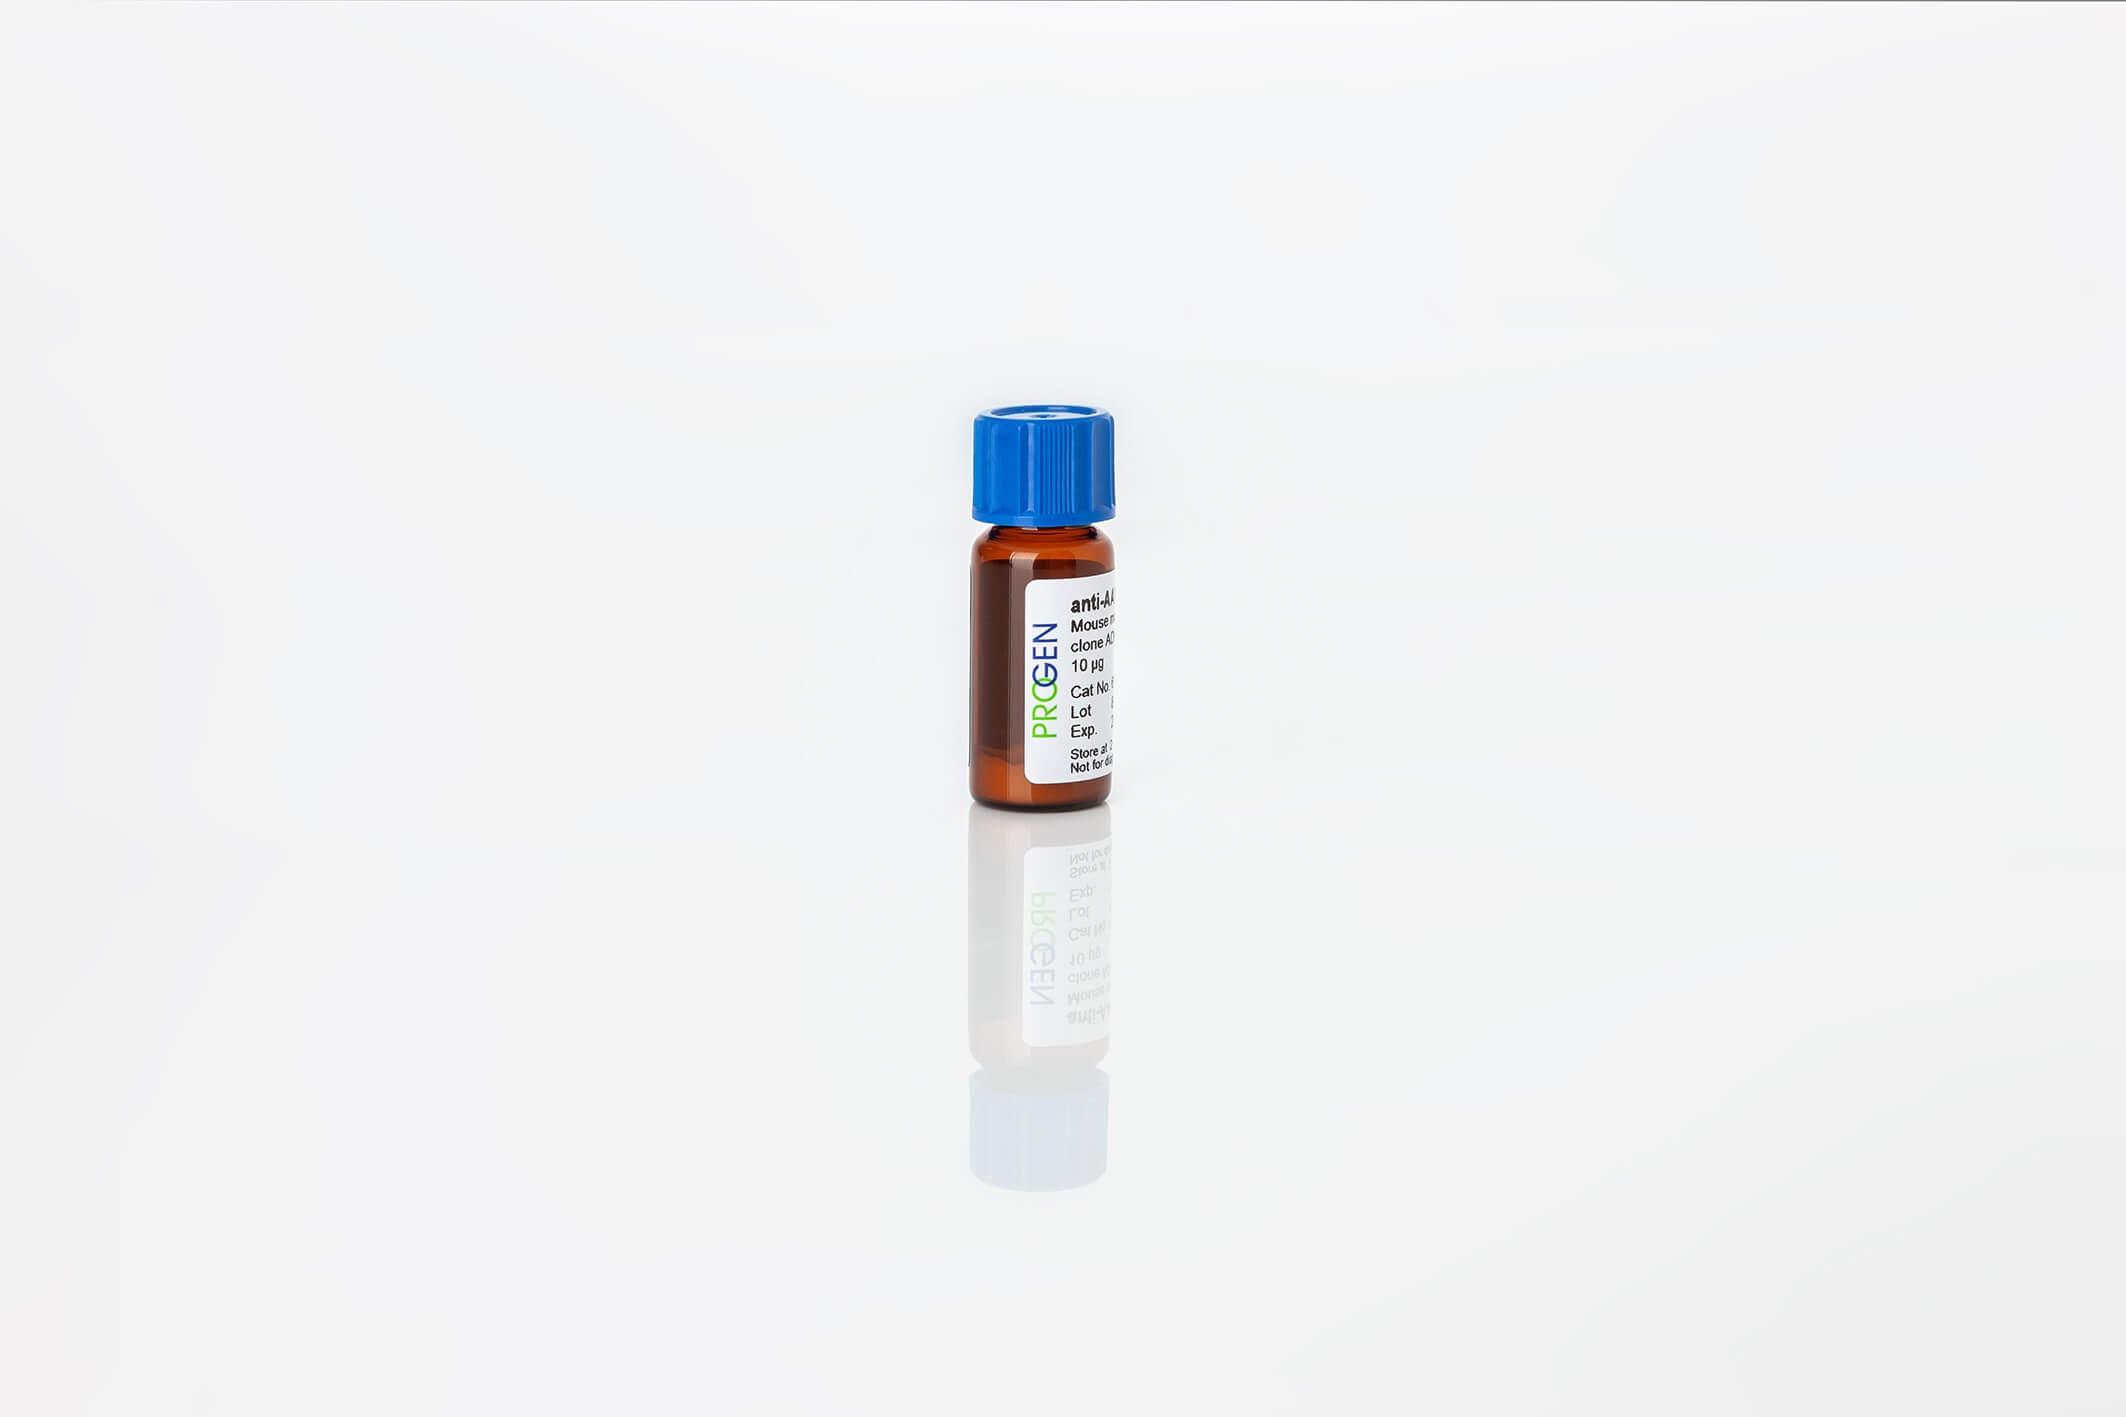 anti-Mucin 2 mouse monoclonal, MUC-2/Ccp58, supernatant